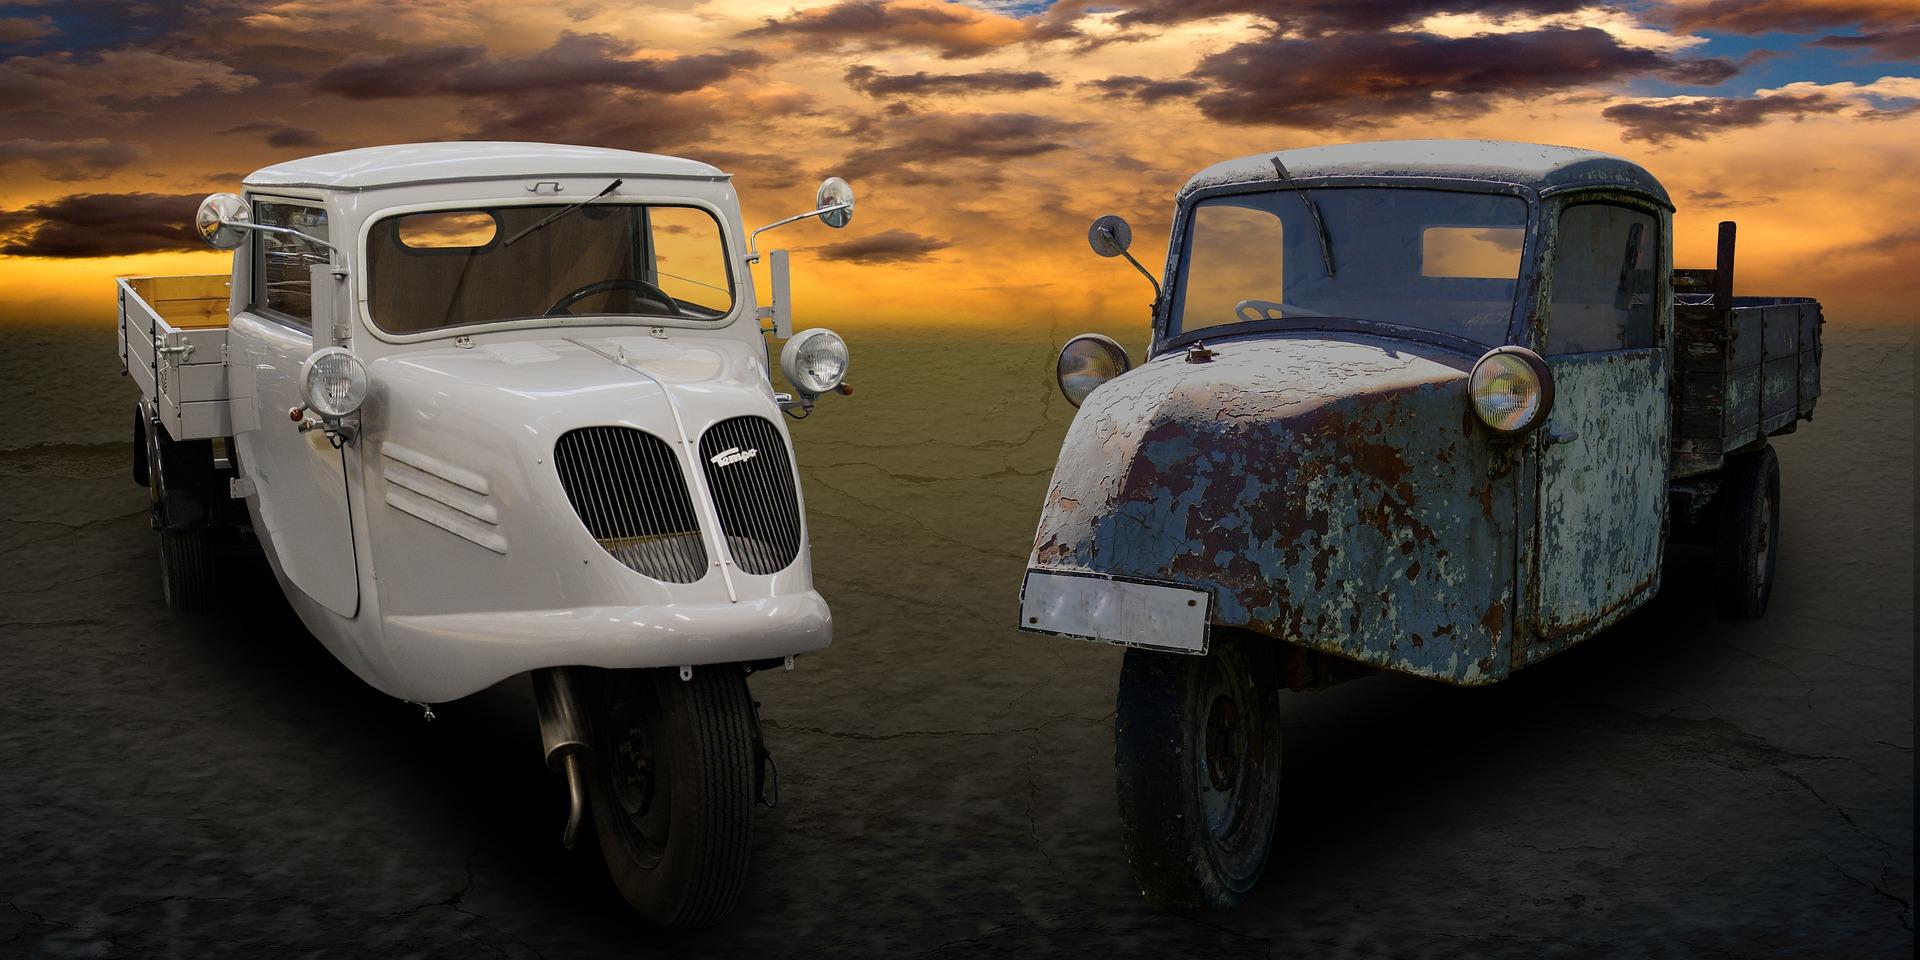 Zwei Fahrzeuge